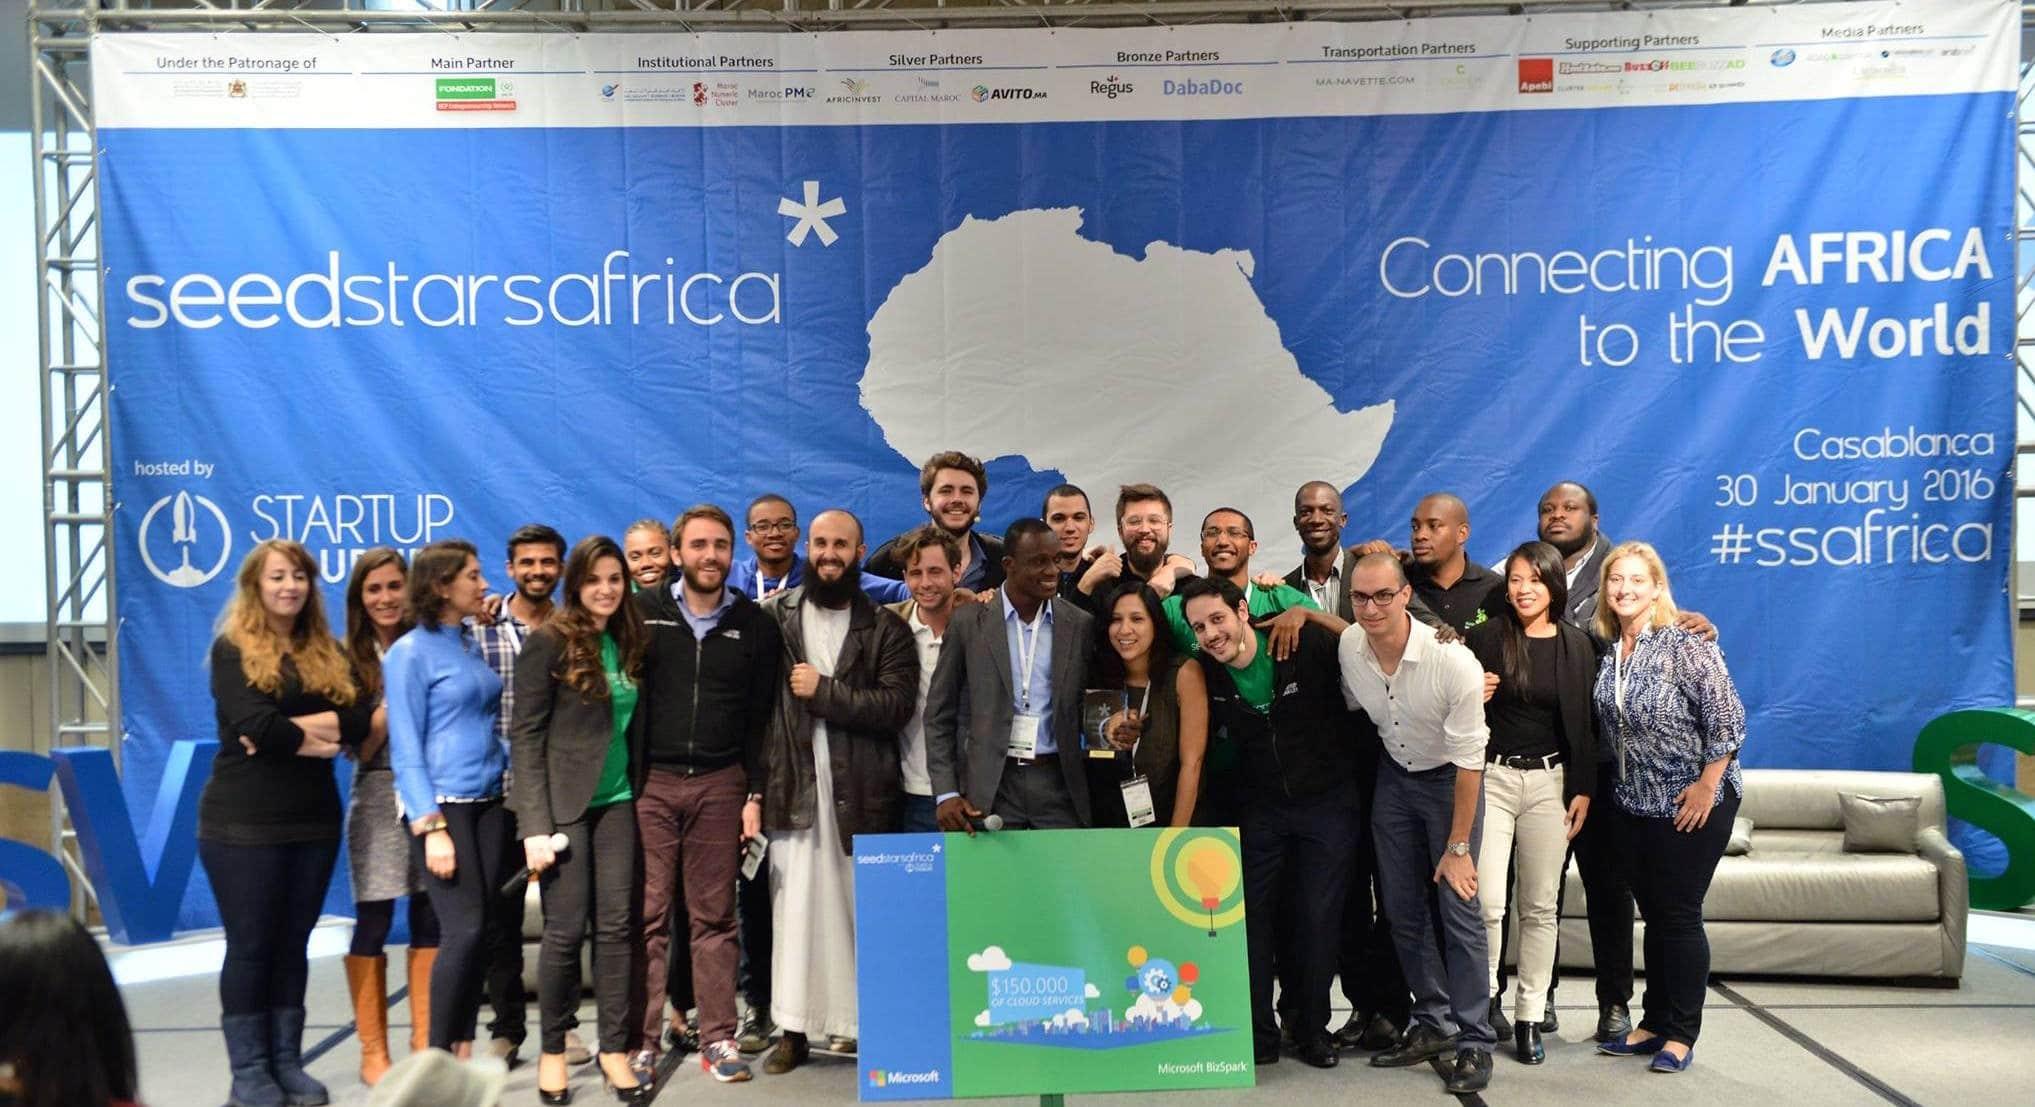 Startup-africa-startupyourlife-seedstarsafrica